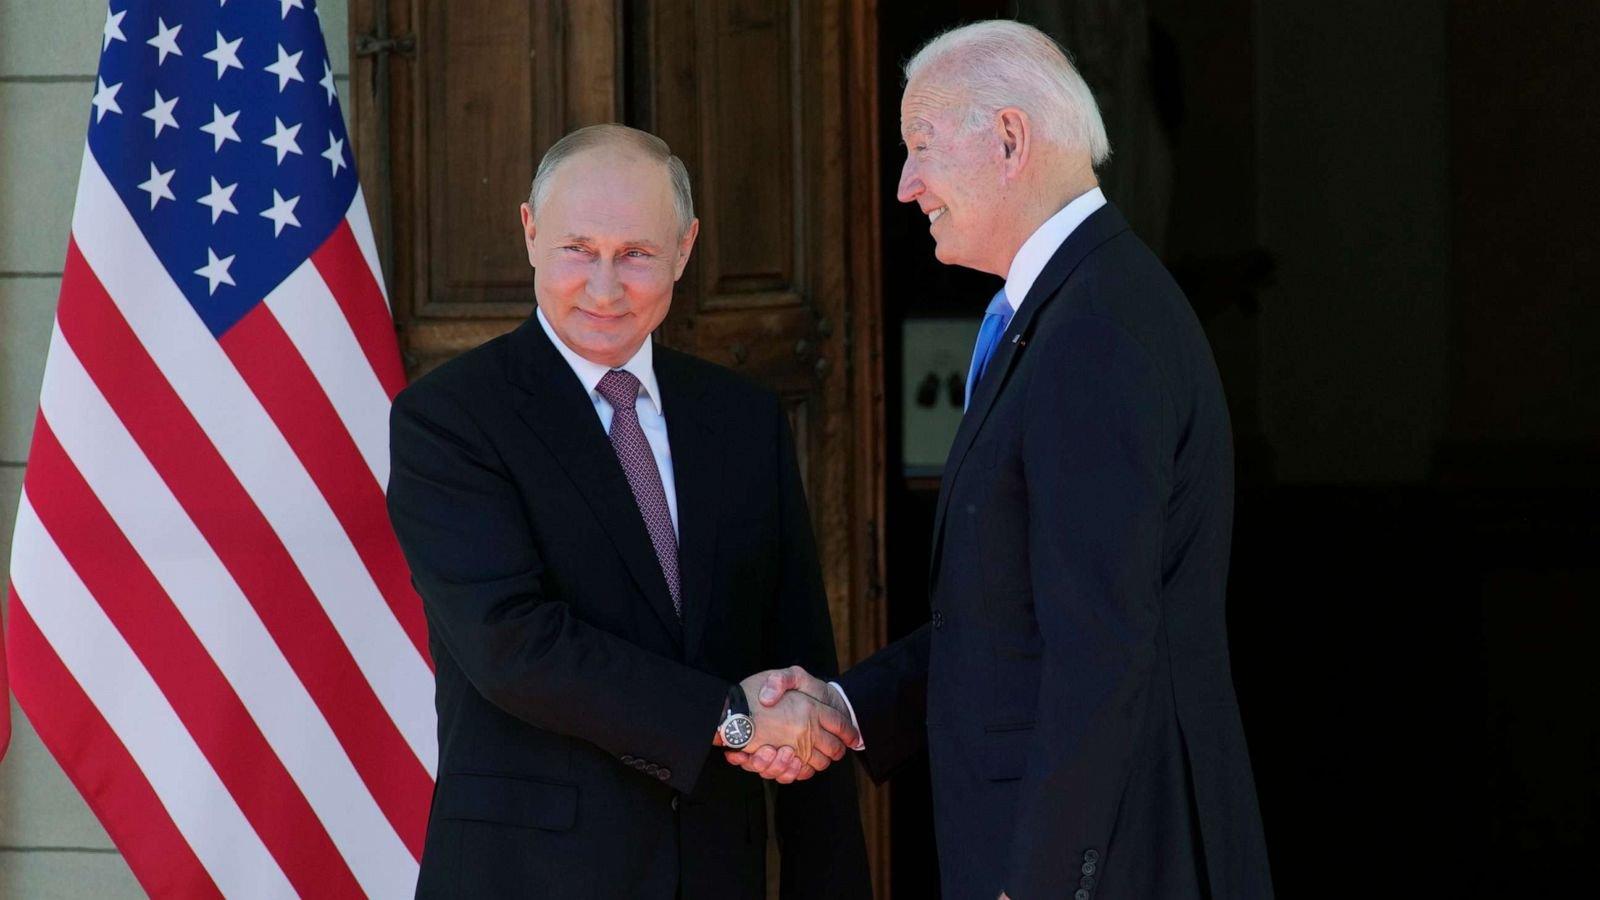 Biden-Putin summit live updates: High-stakes meeting begins